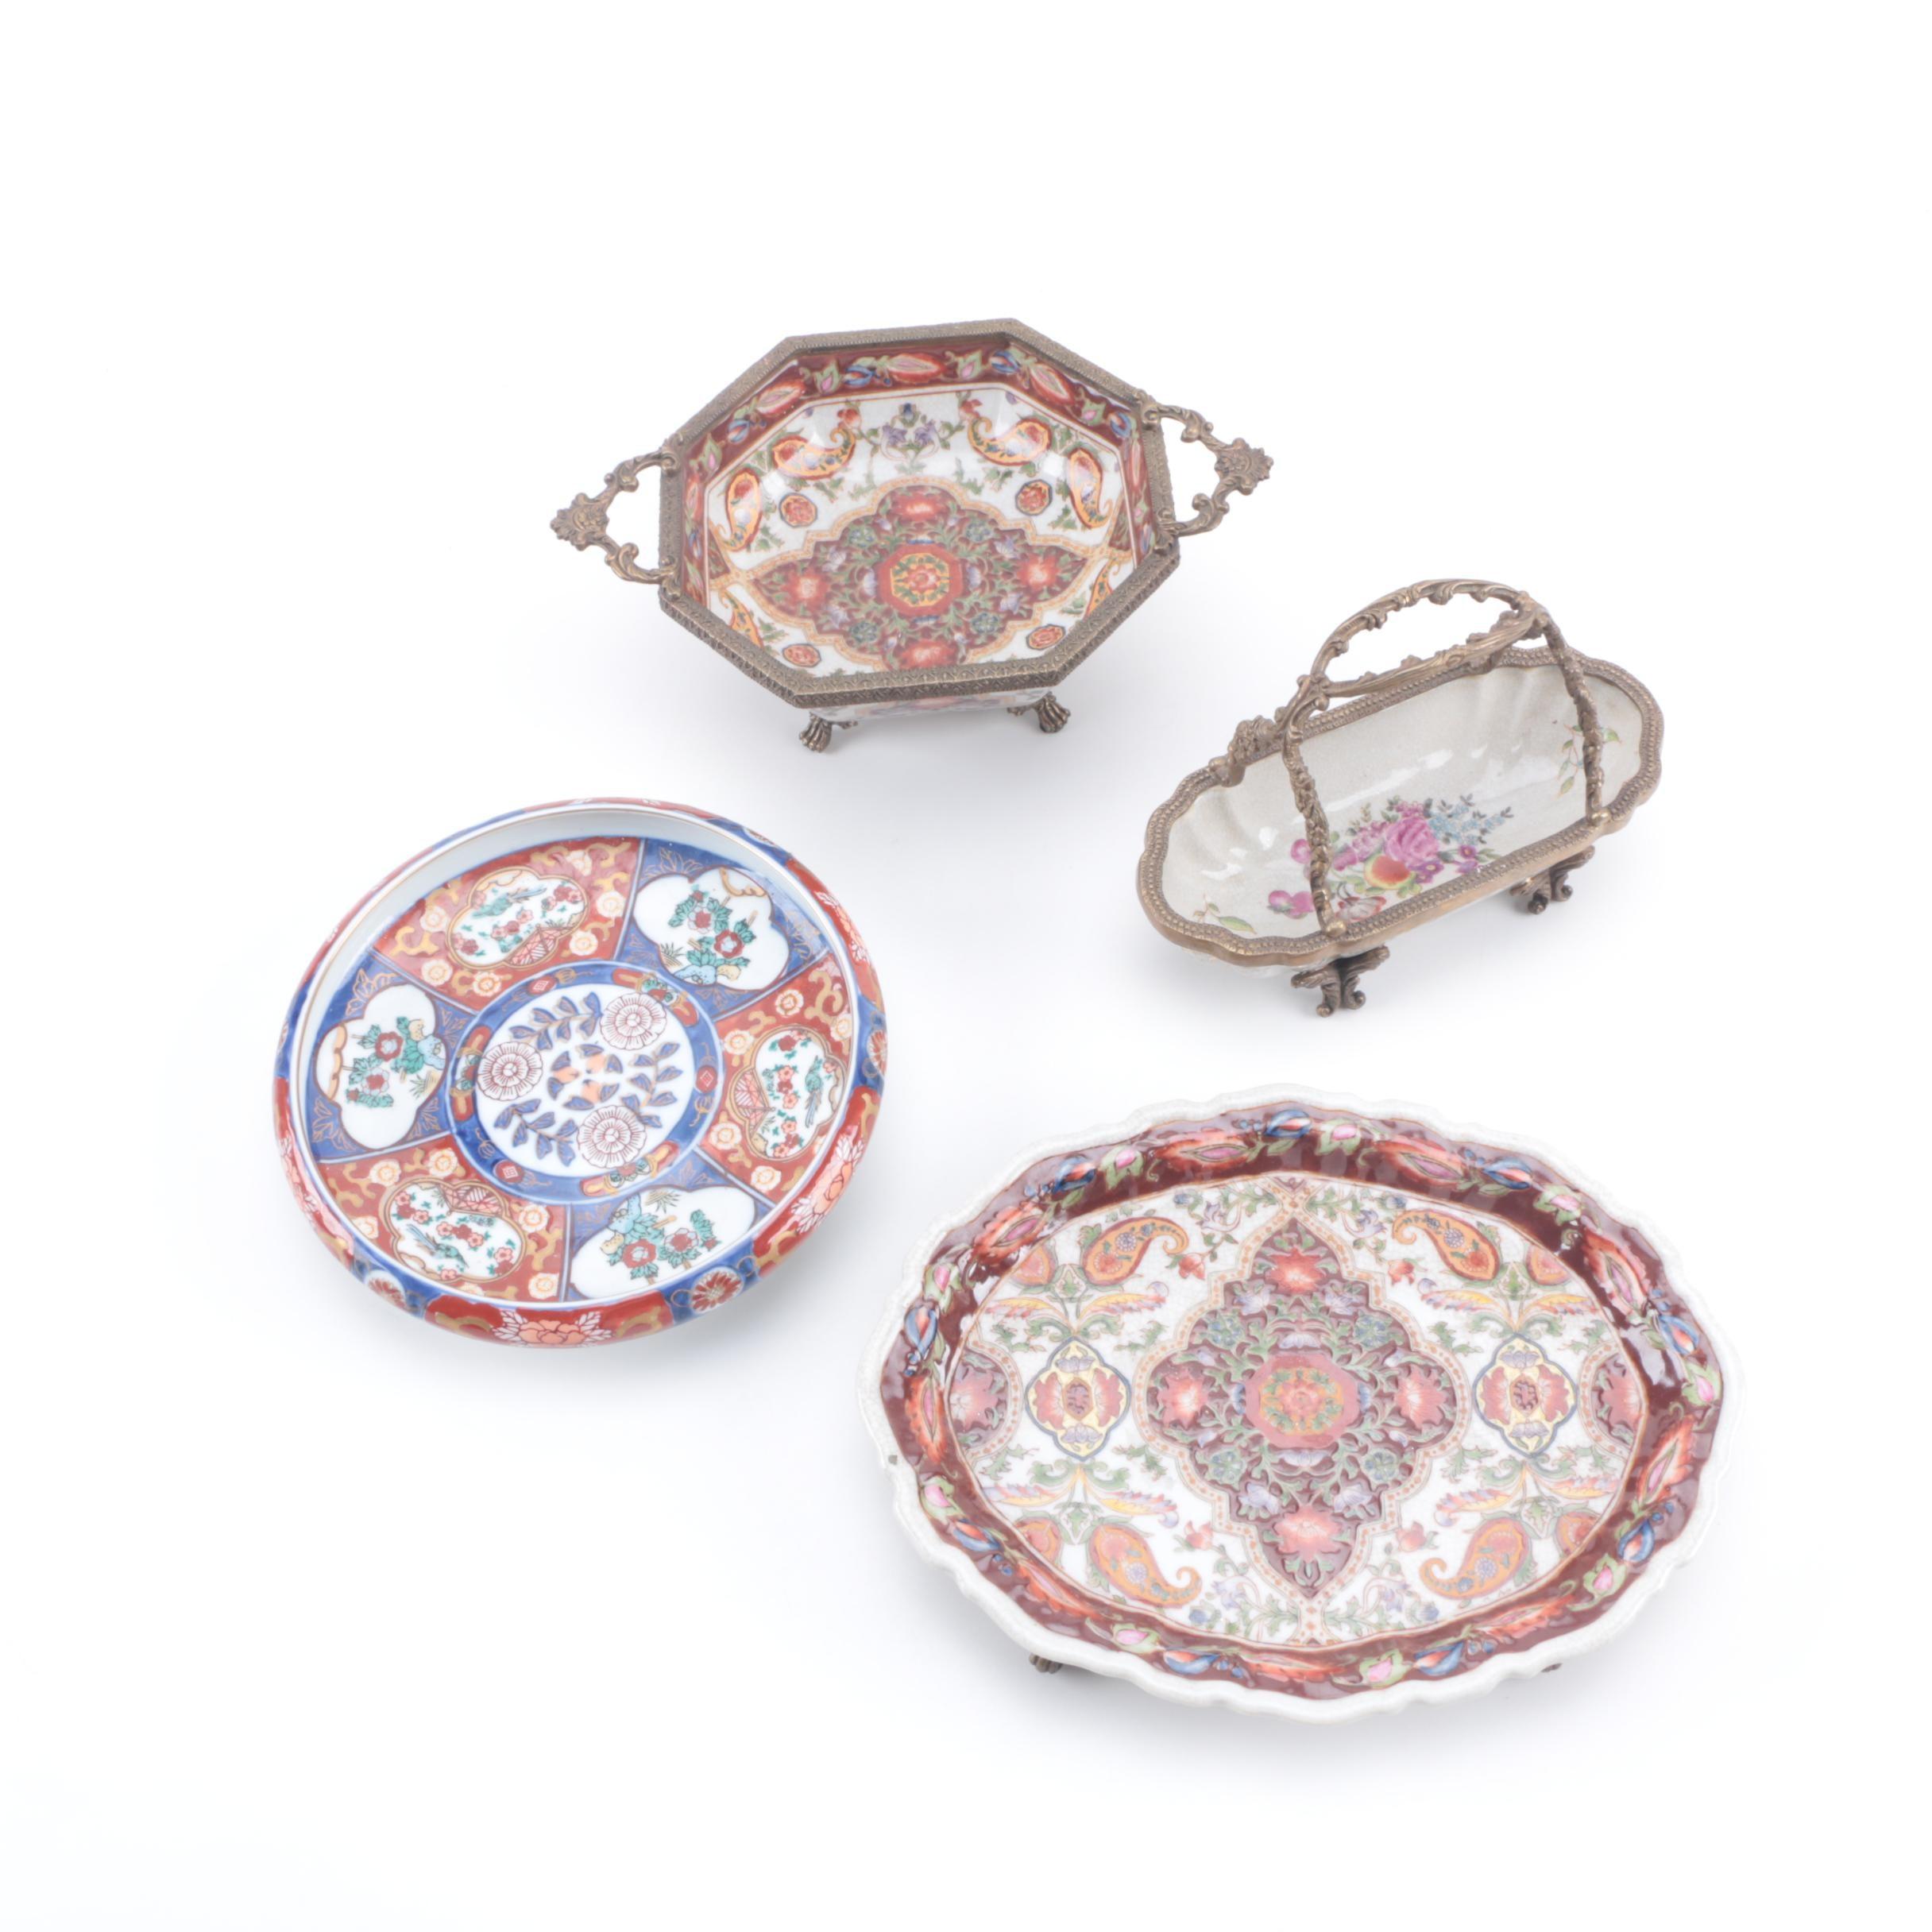 East Asian Ceramic Decorative Bowls